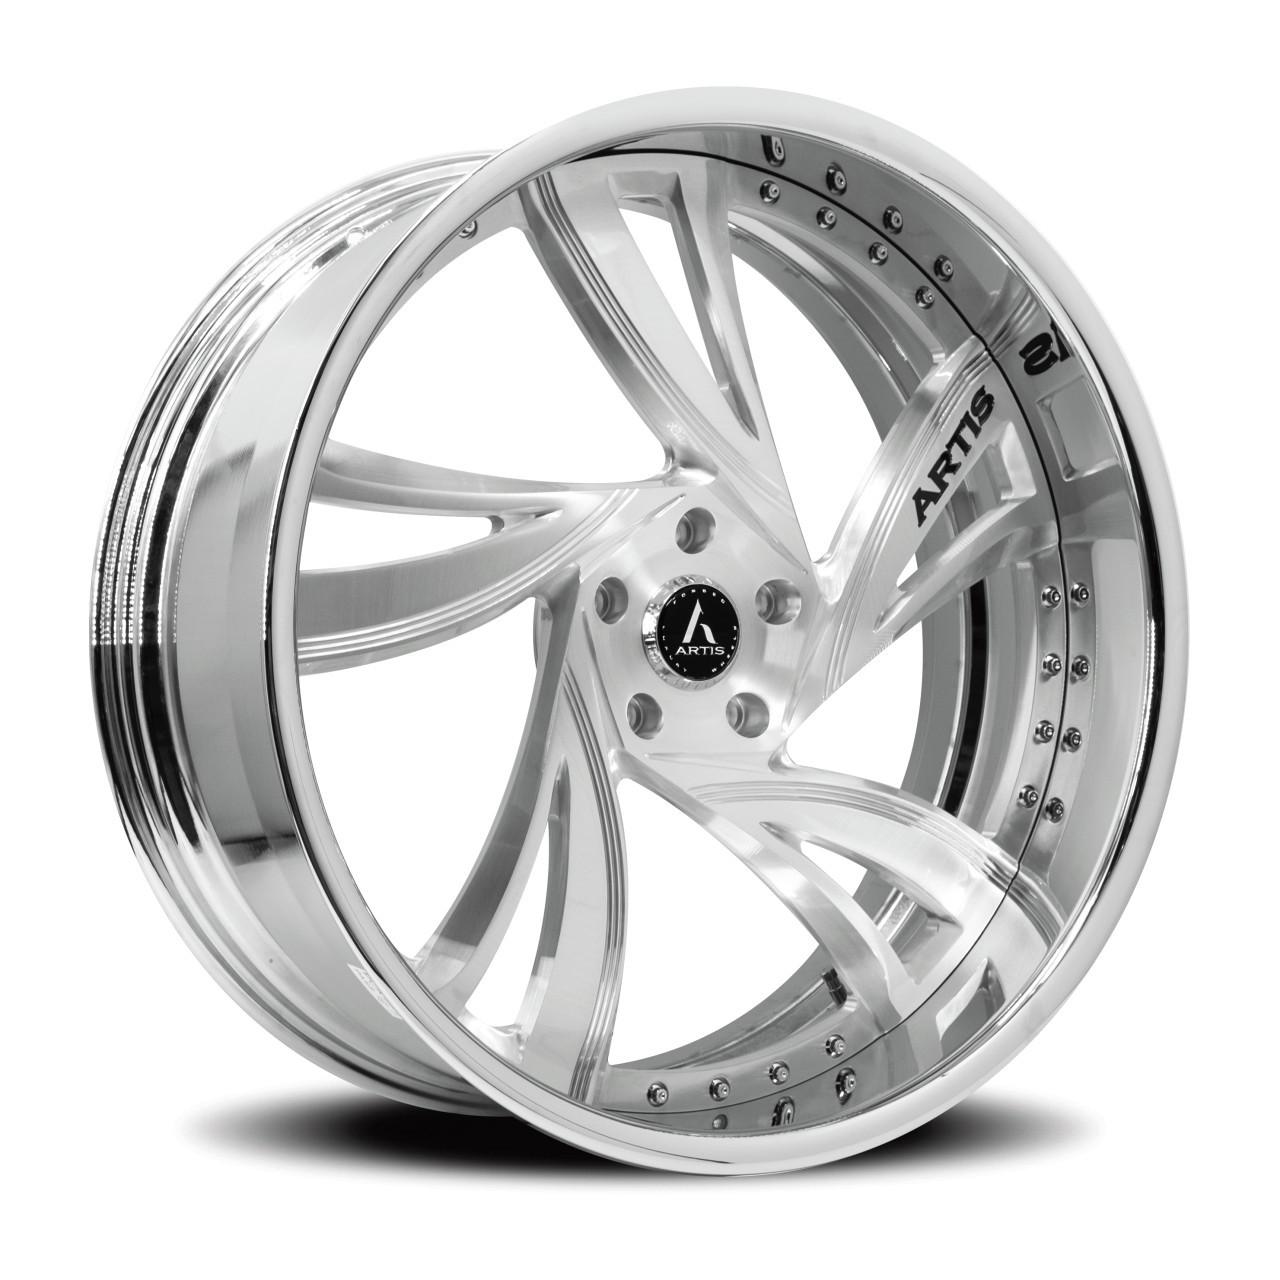 Artis Kingston forged wheels